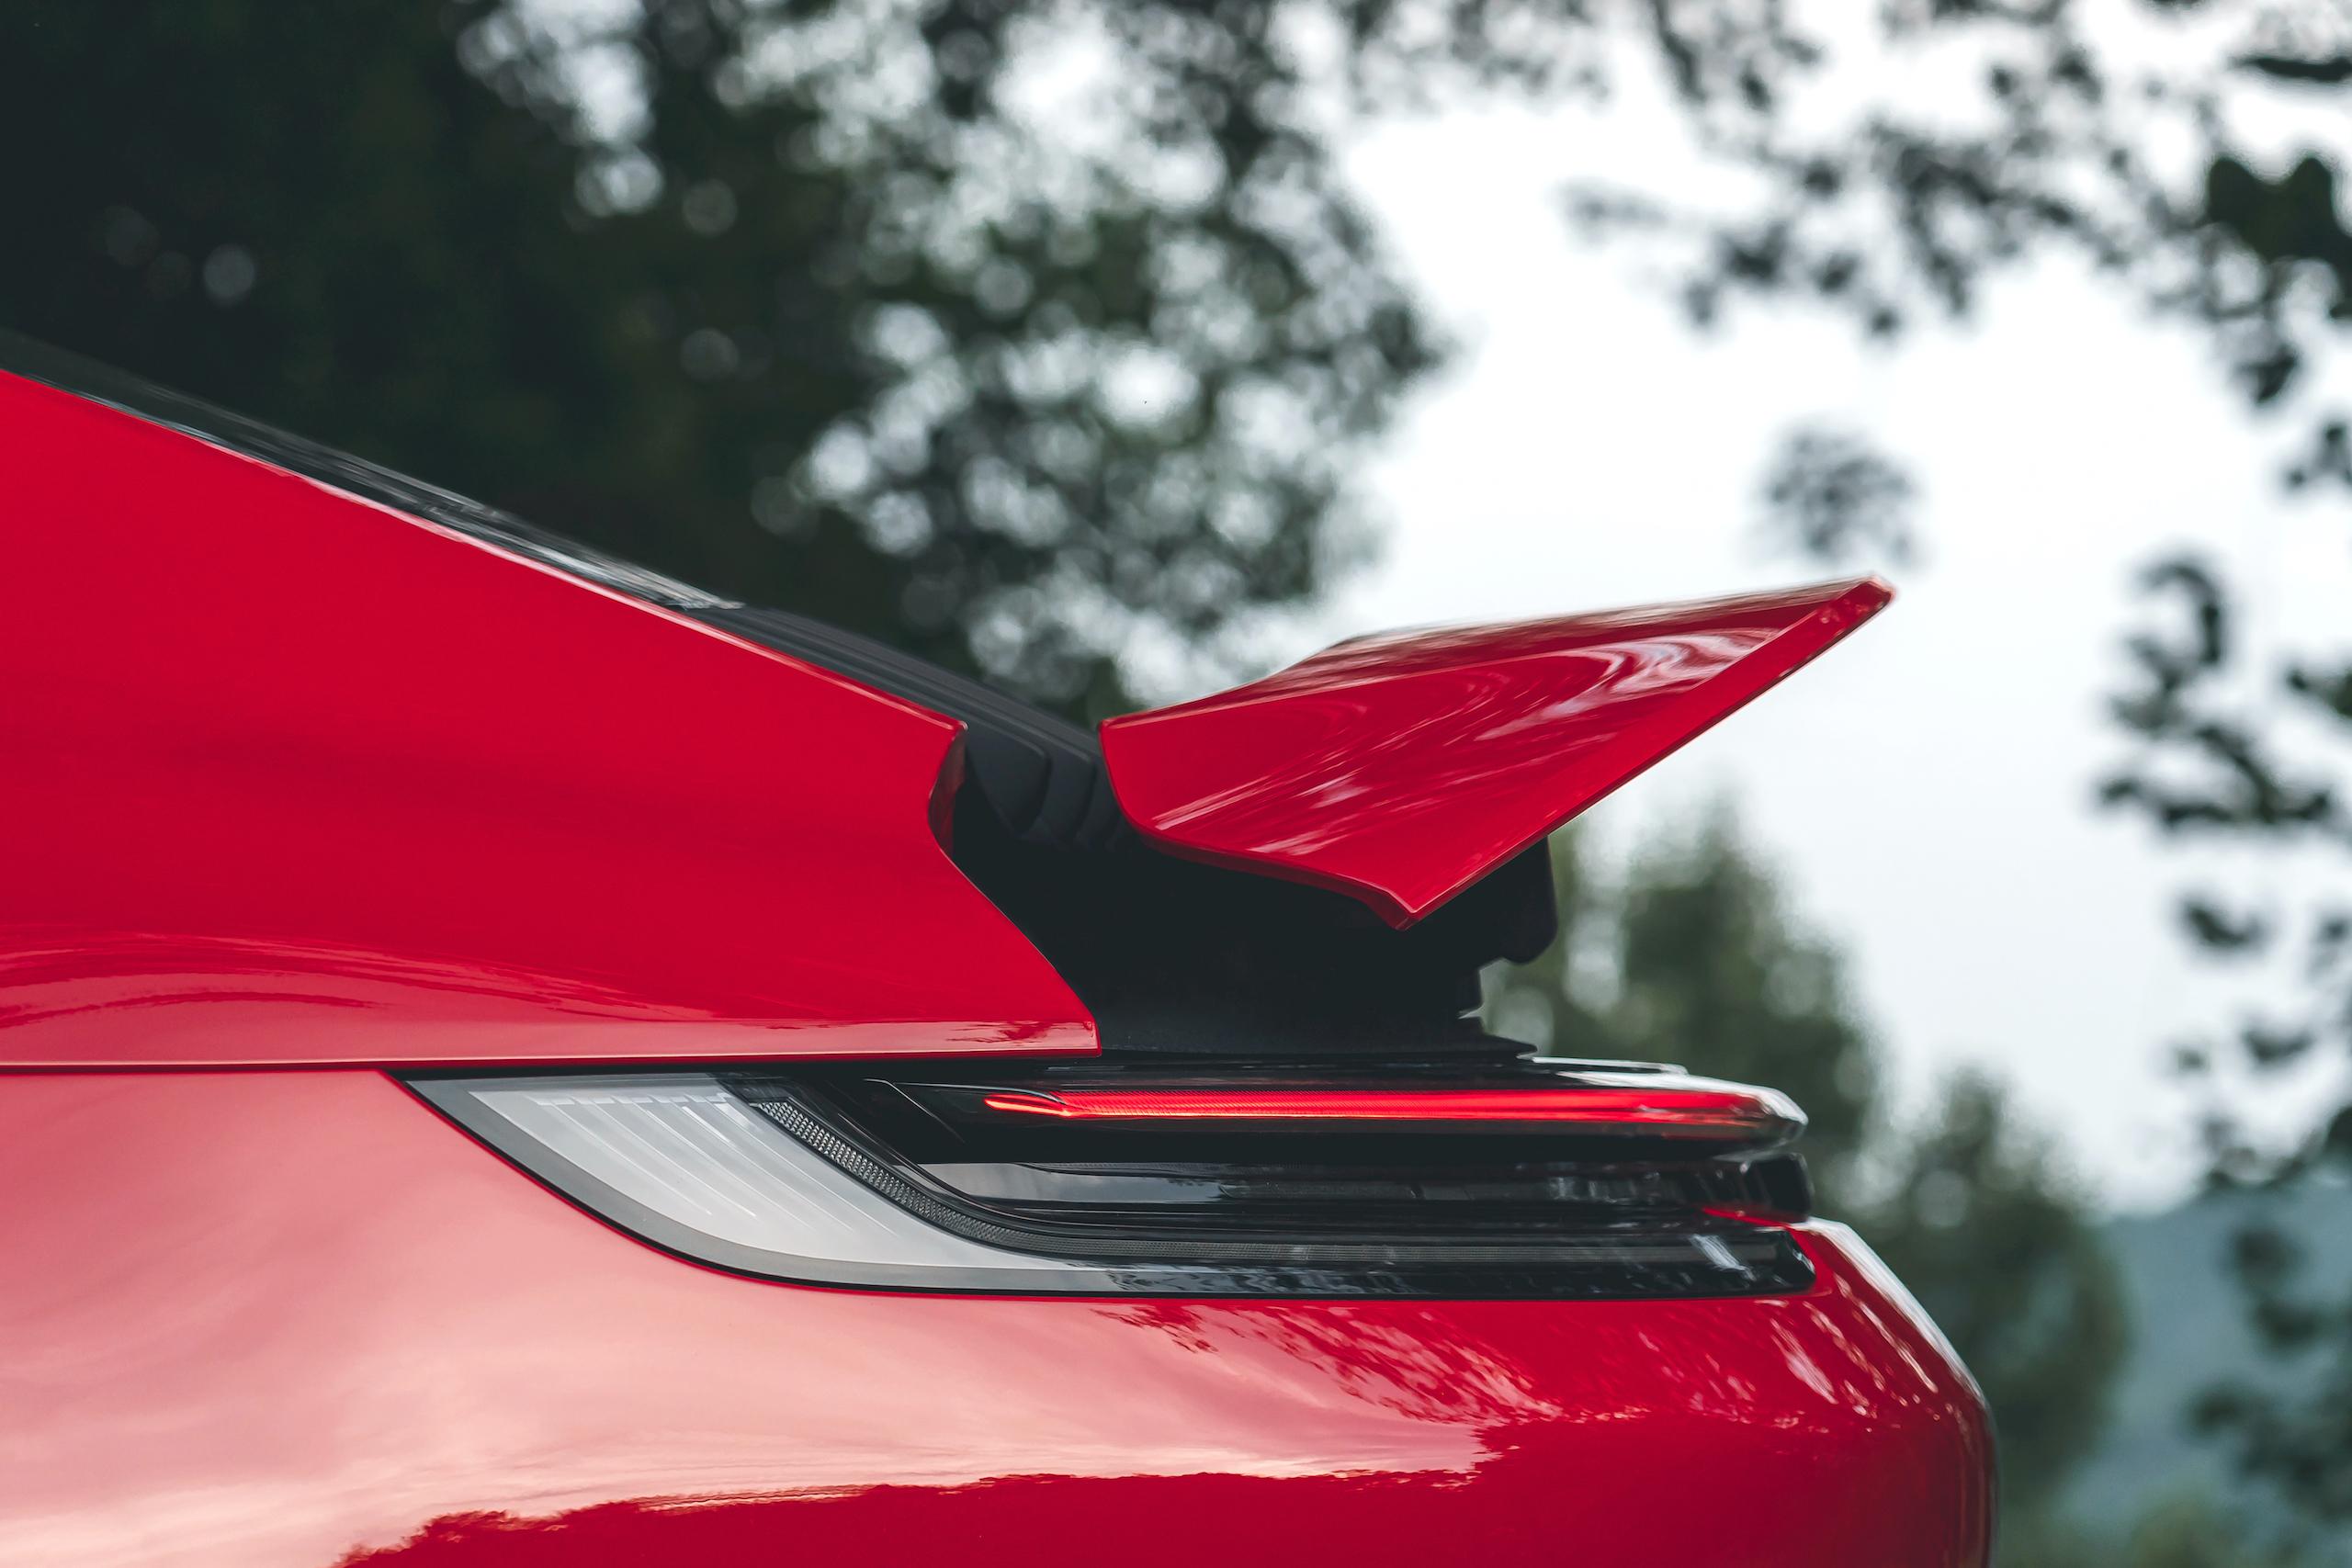 Porsche 911 GTS rear lip